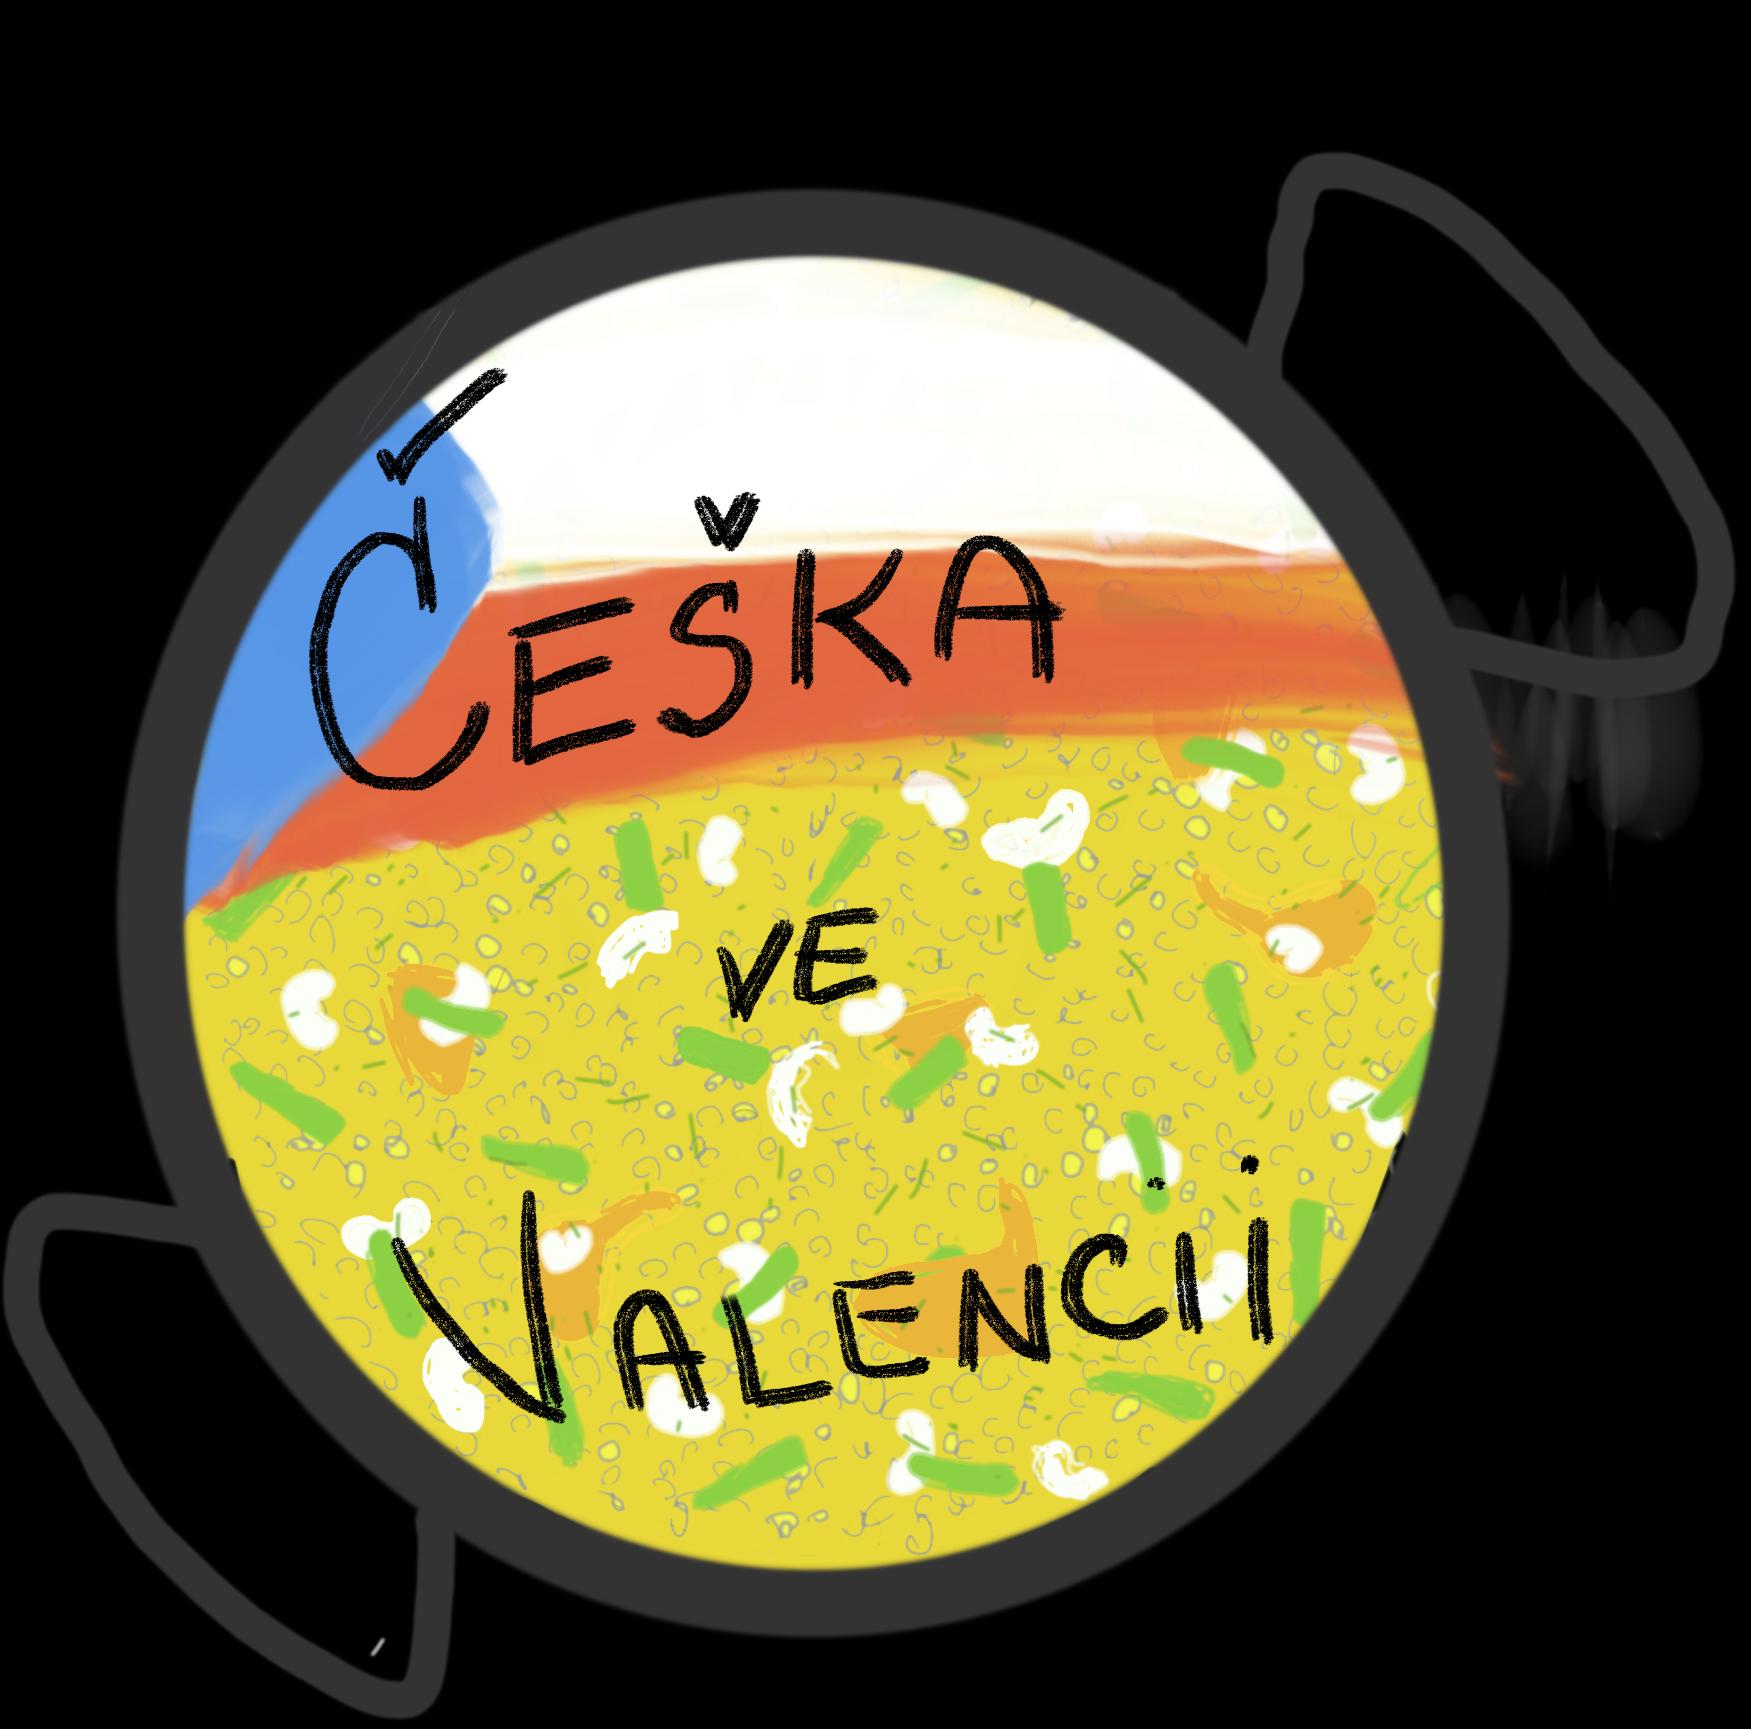 Češka ve Valencii